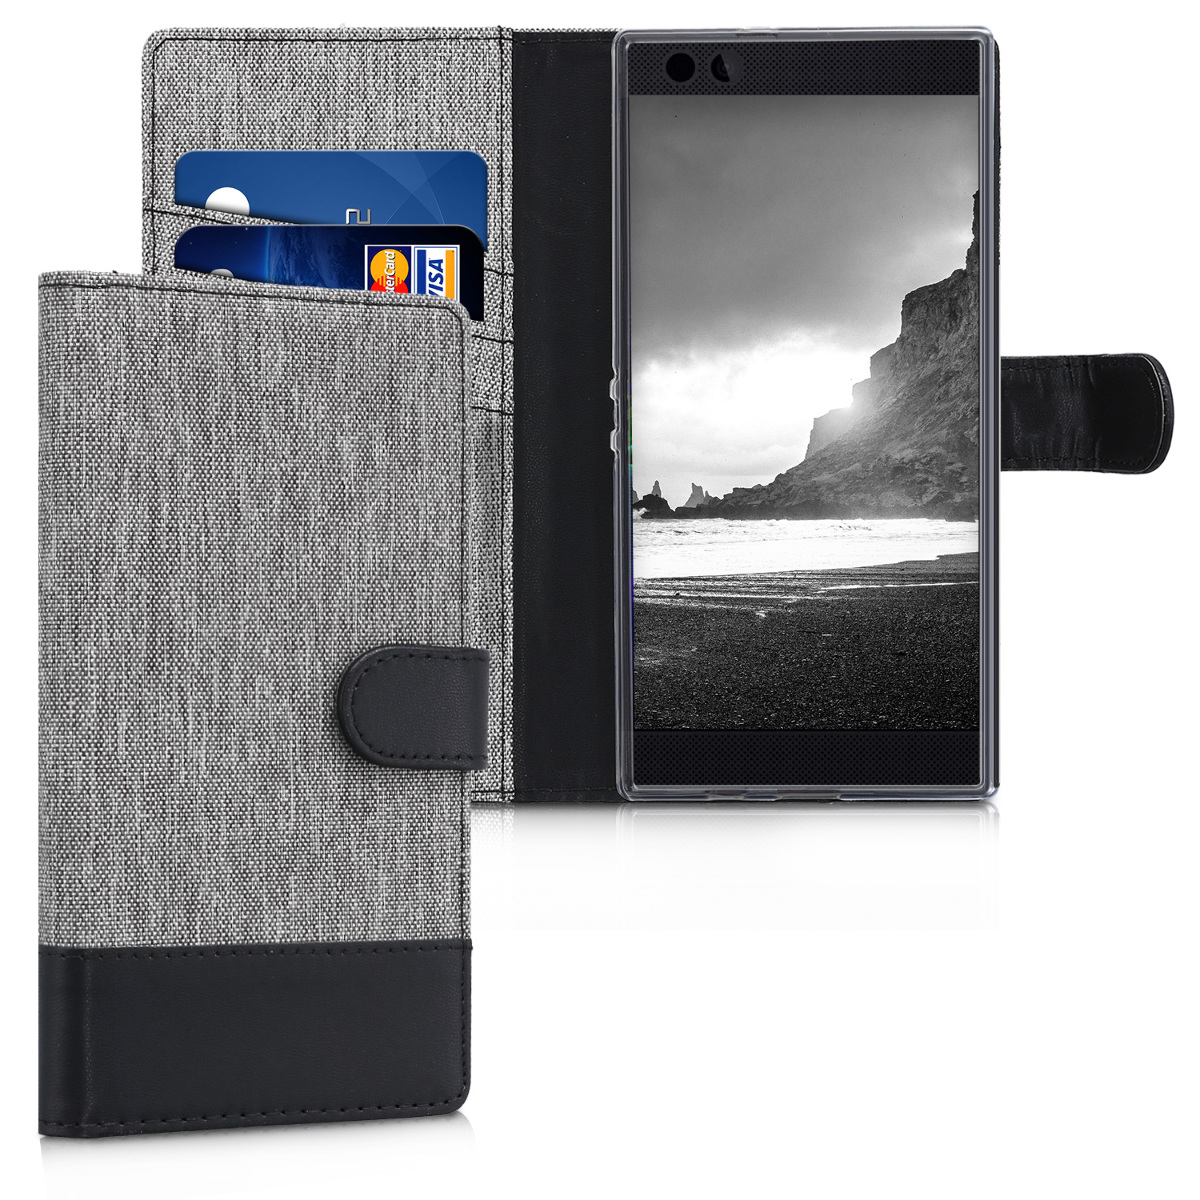 KW Θήκη-Πορτοφόλι Razer Phone - Γκρι/Μαύρο  (45035.01)